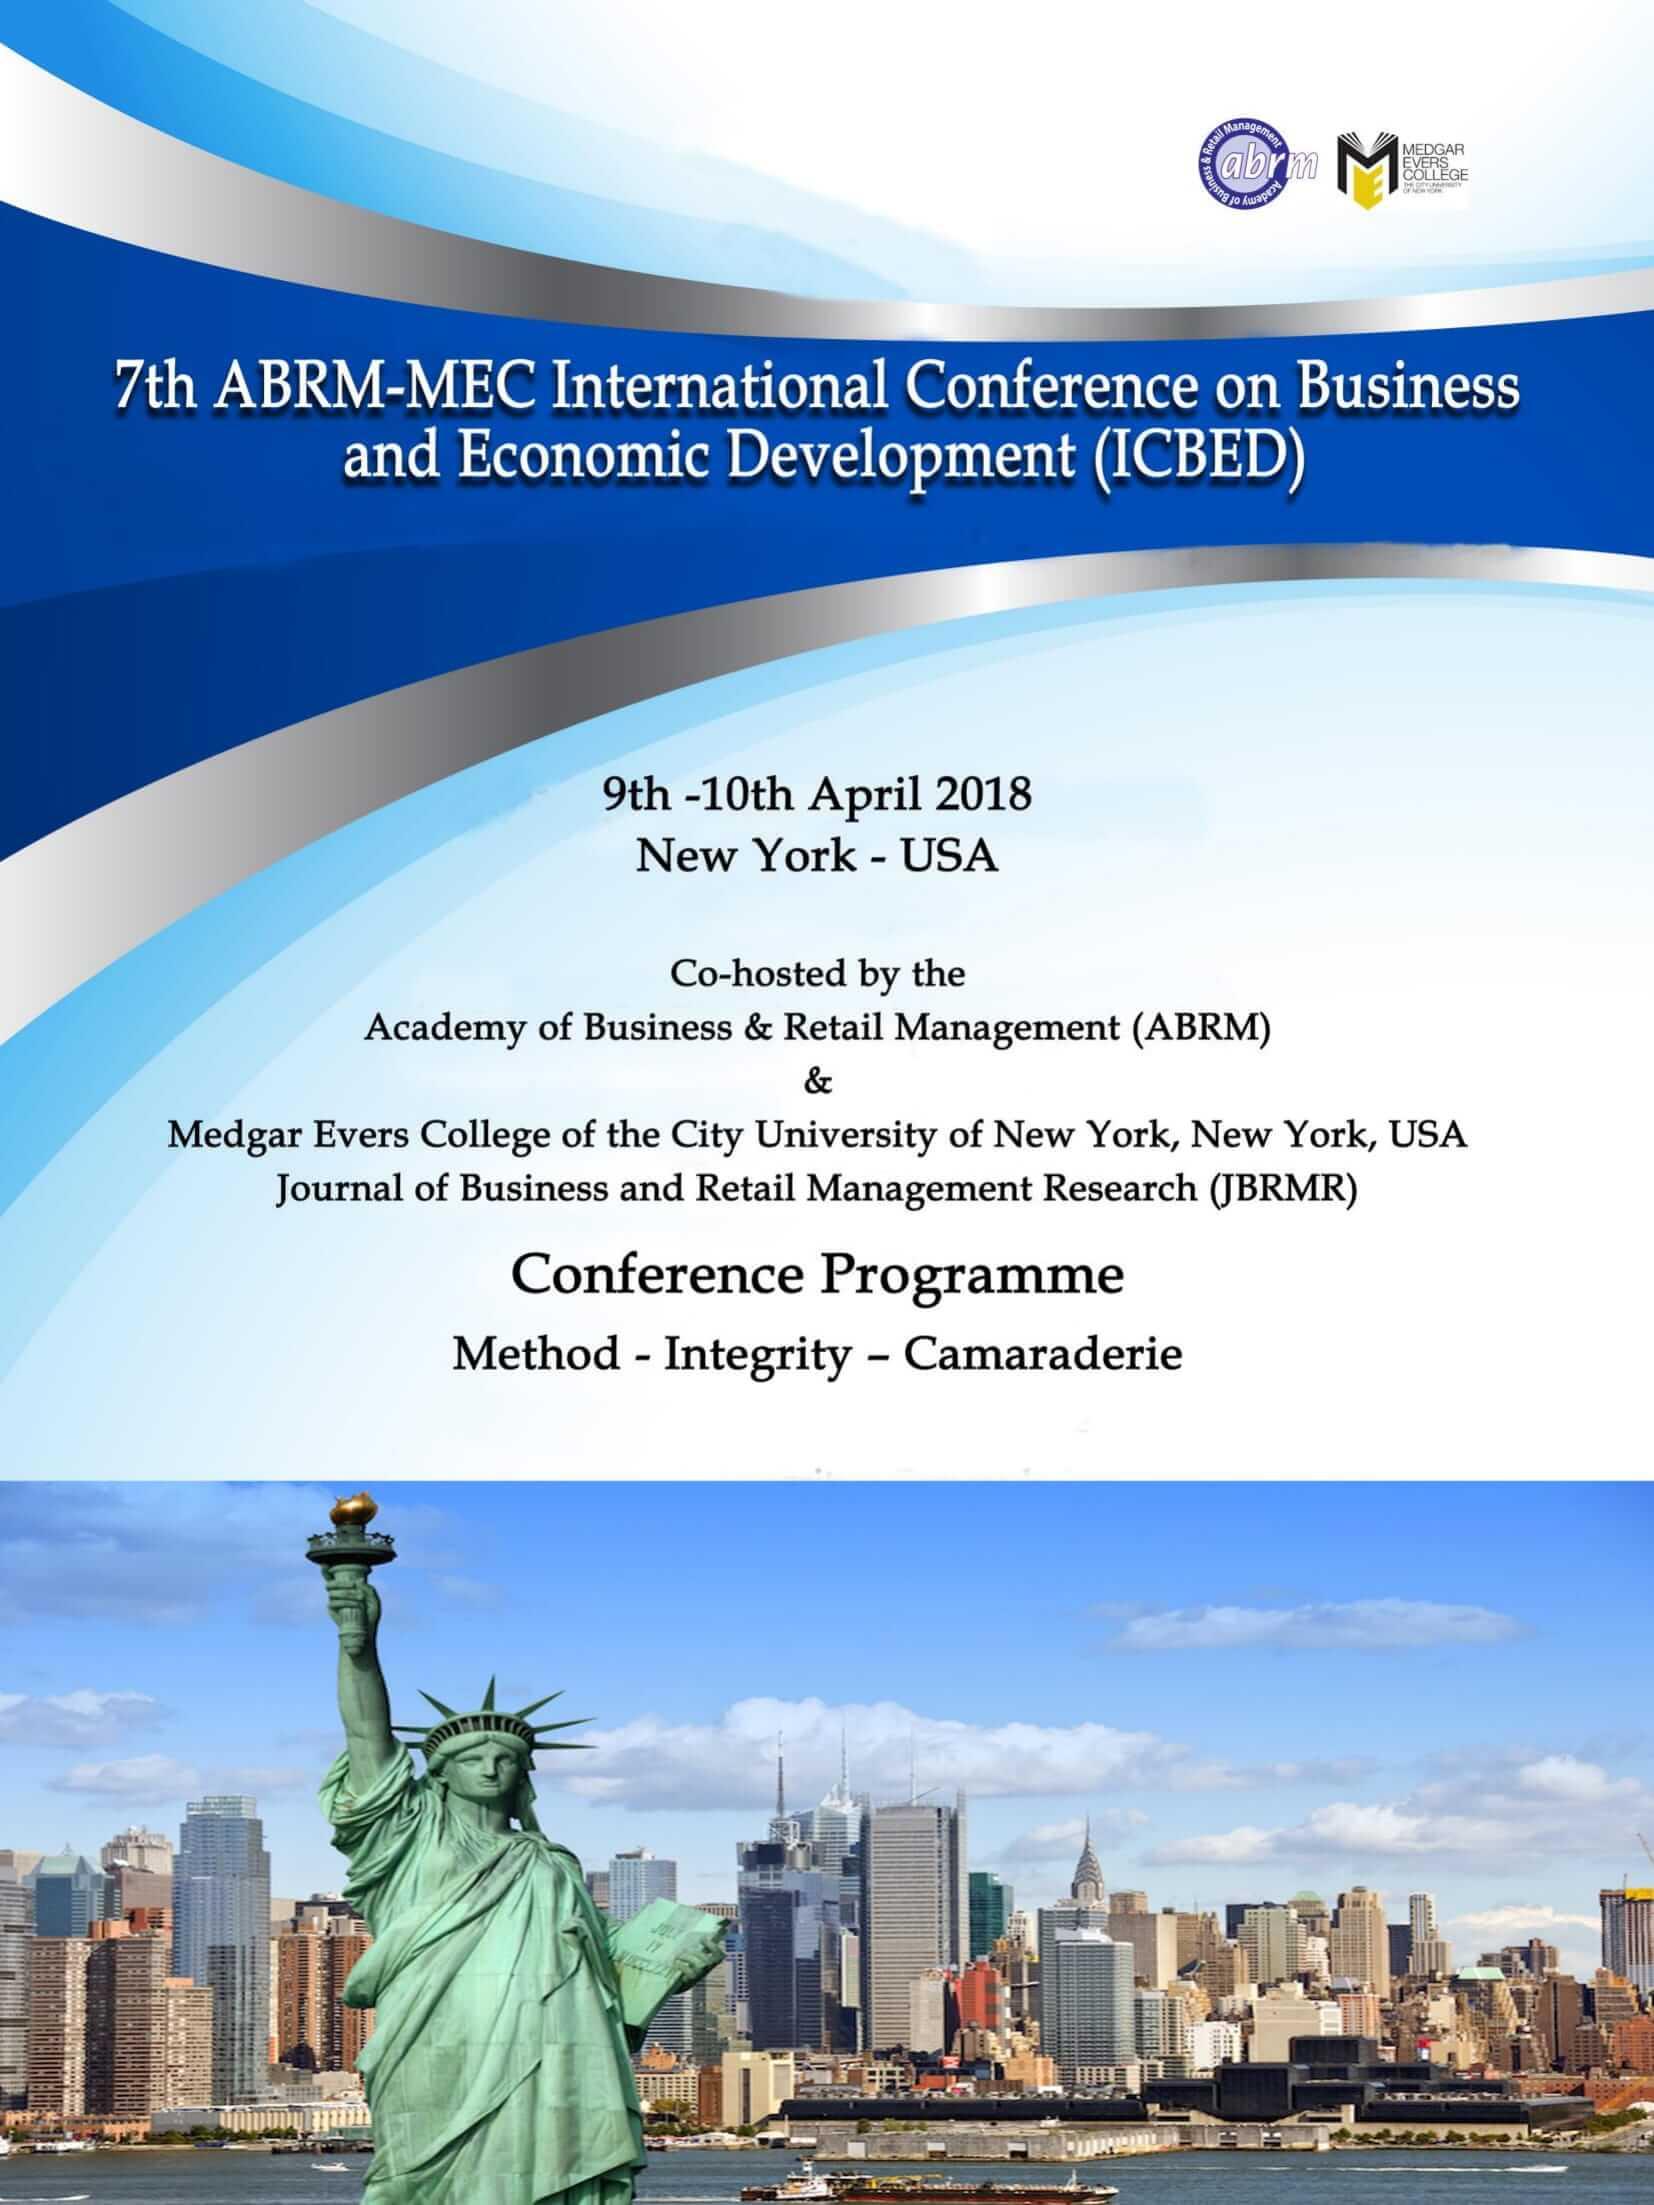 7th ABRM-MEC ICBED